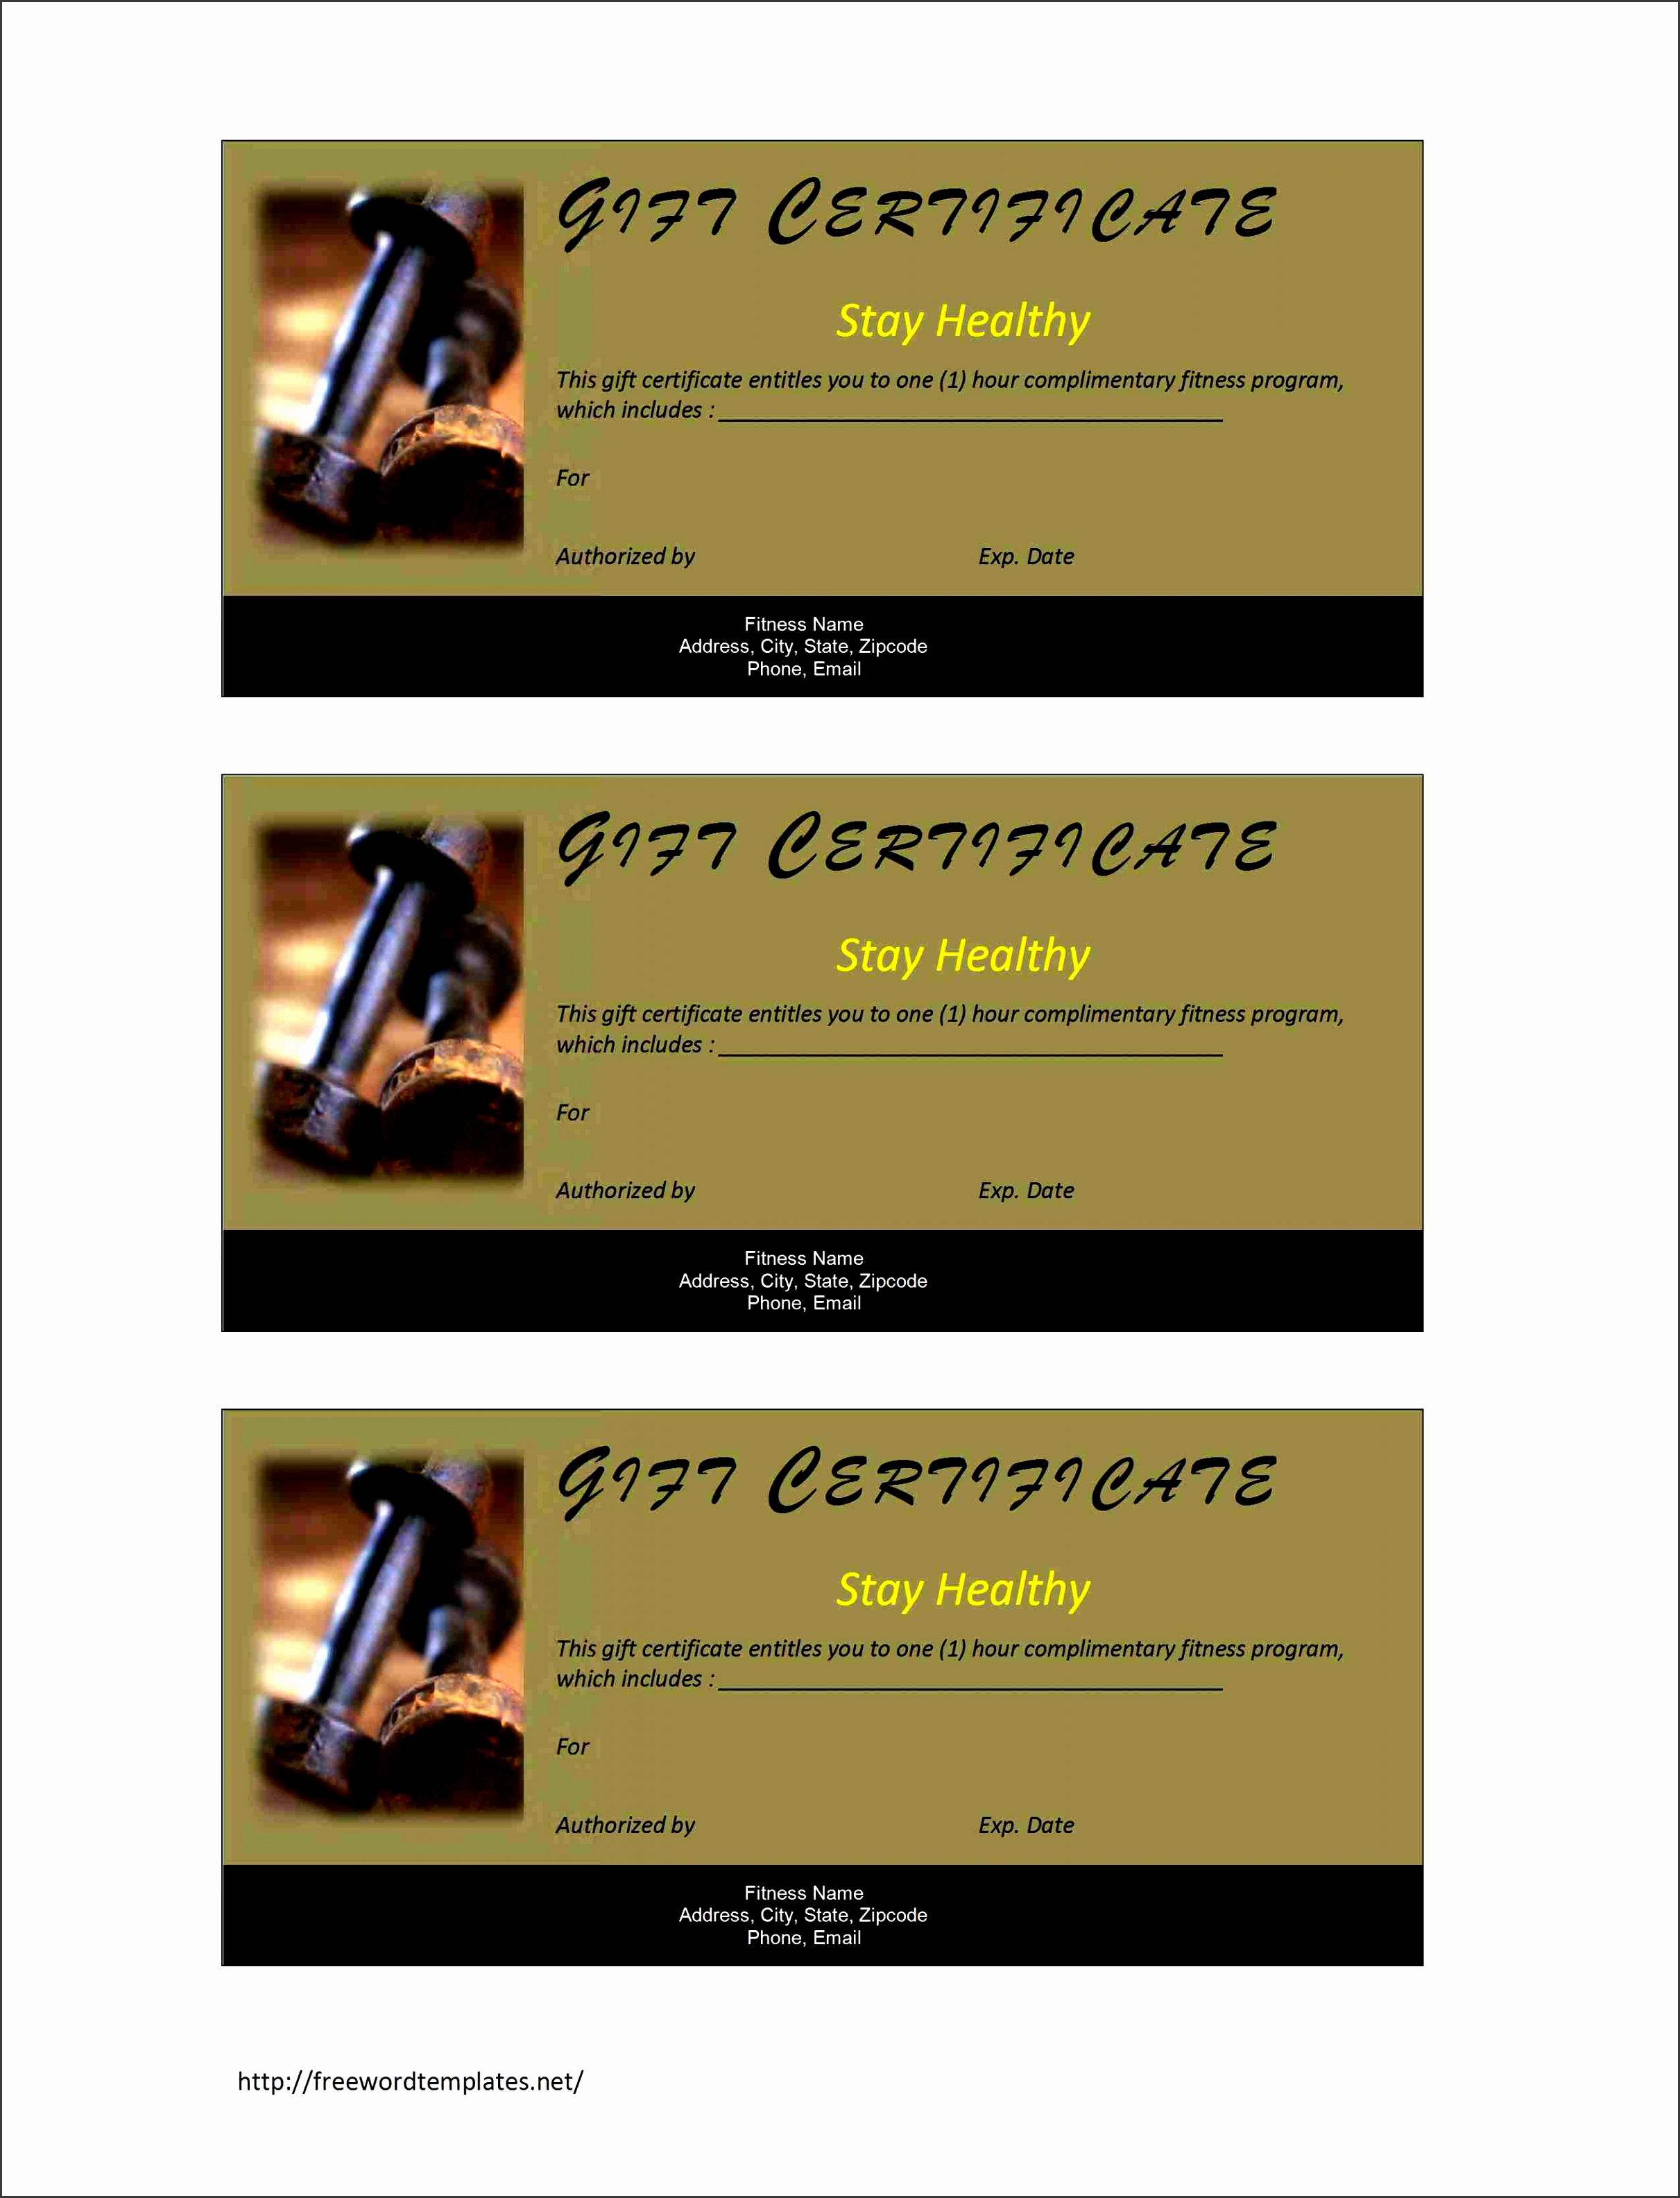 9 restaurant voucher template sampletemplatess sampletemplatess. Black Bedroom Furniture Sets. Home Design Ideas